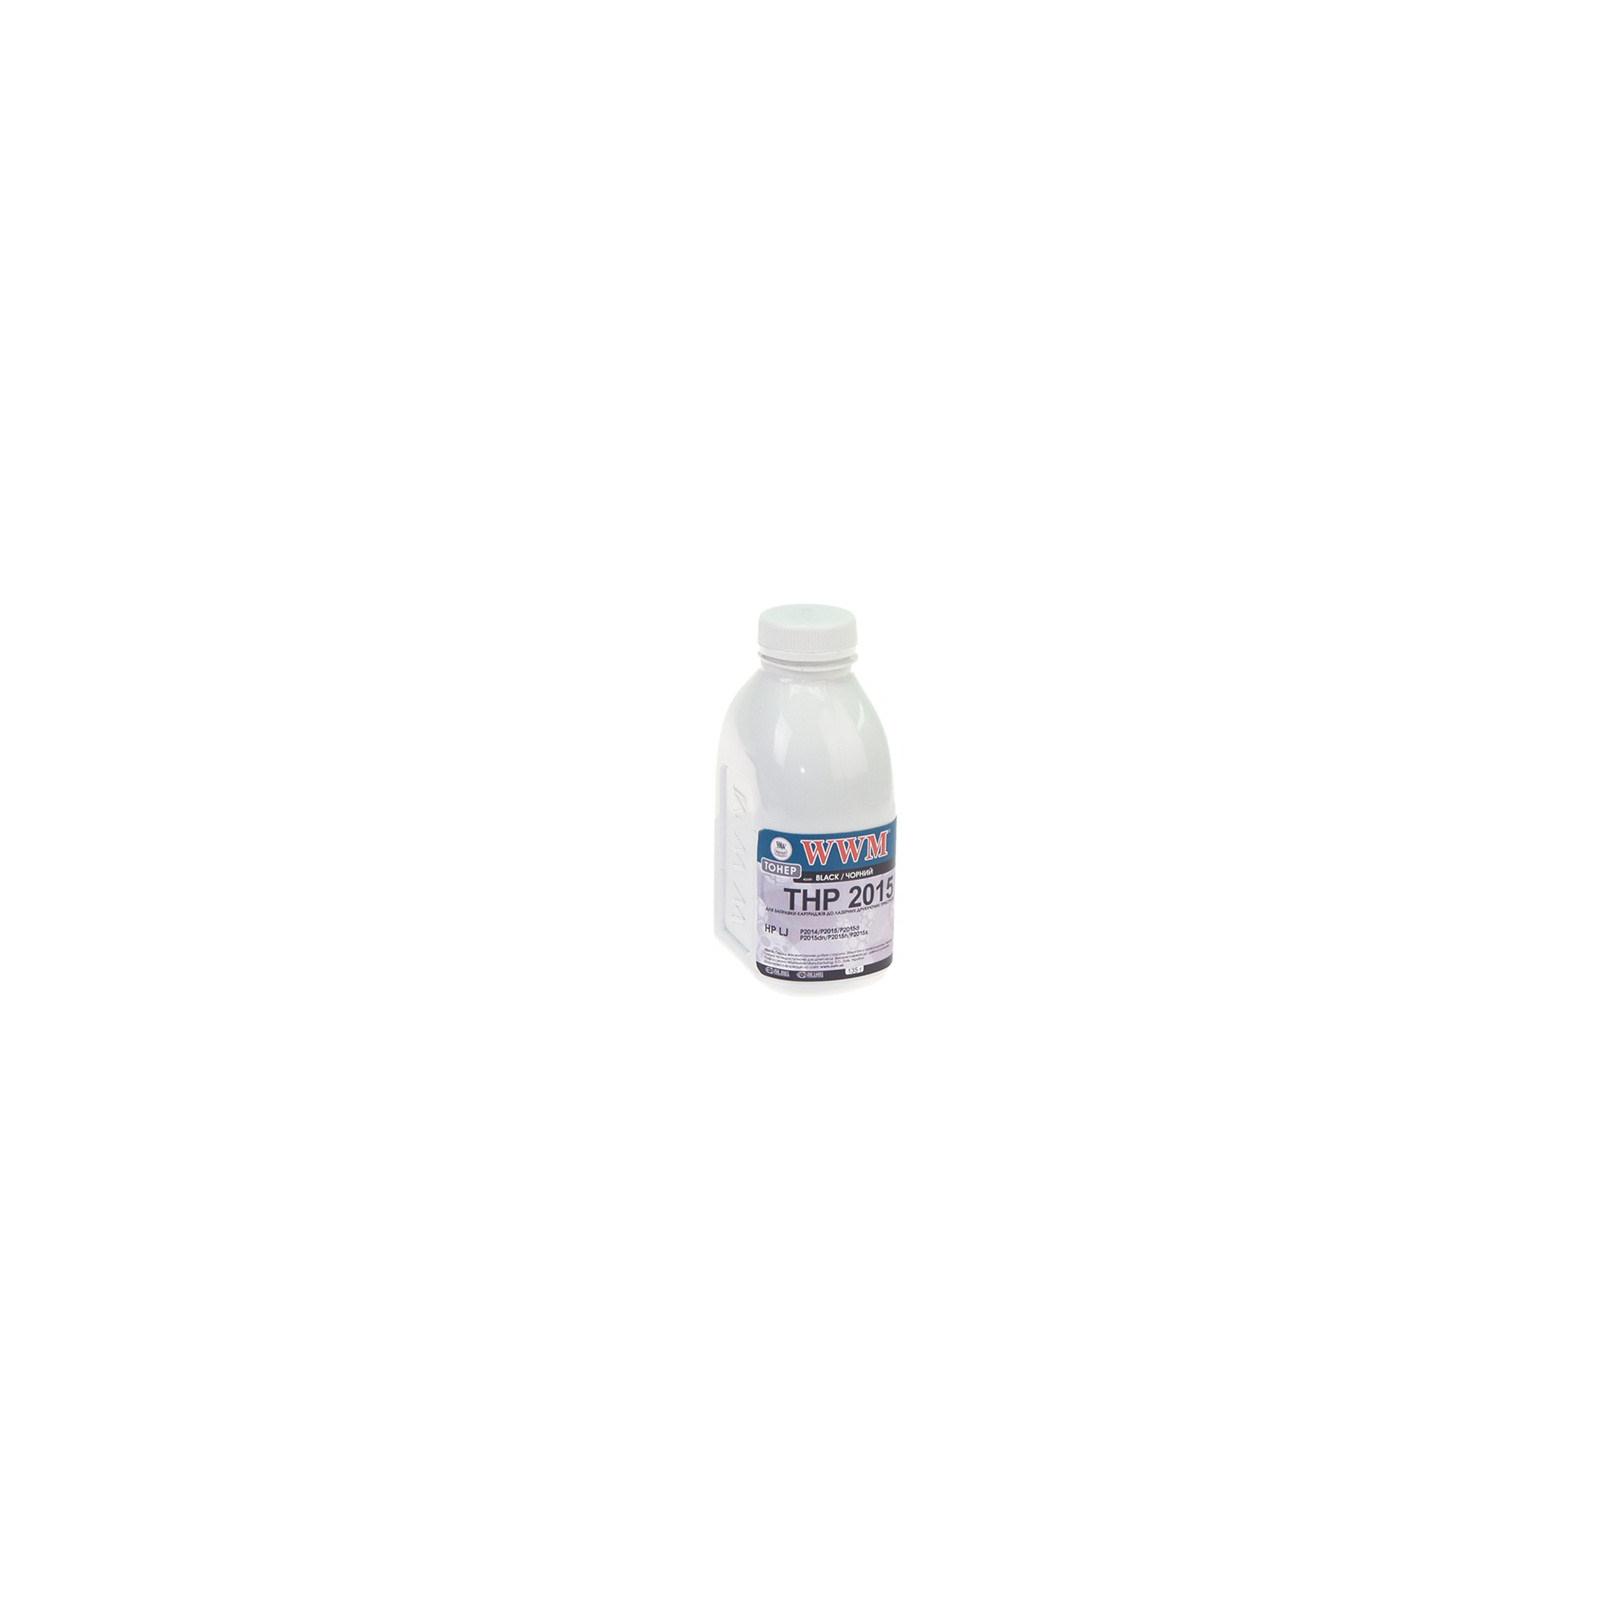 Тонер WWM HP LJ1160/1320 P2015/P2014/M2727nf (TB74)